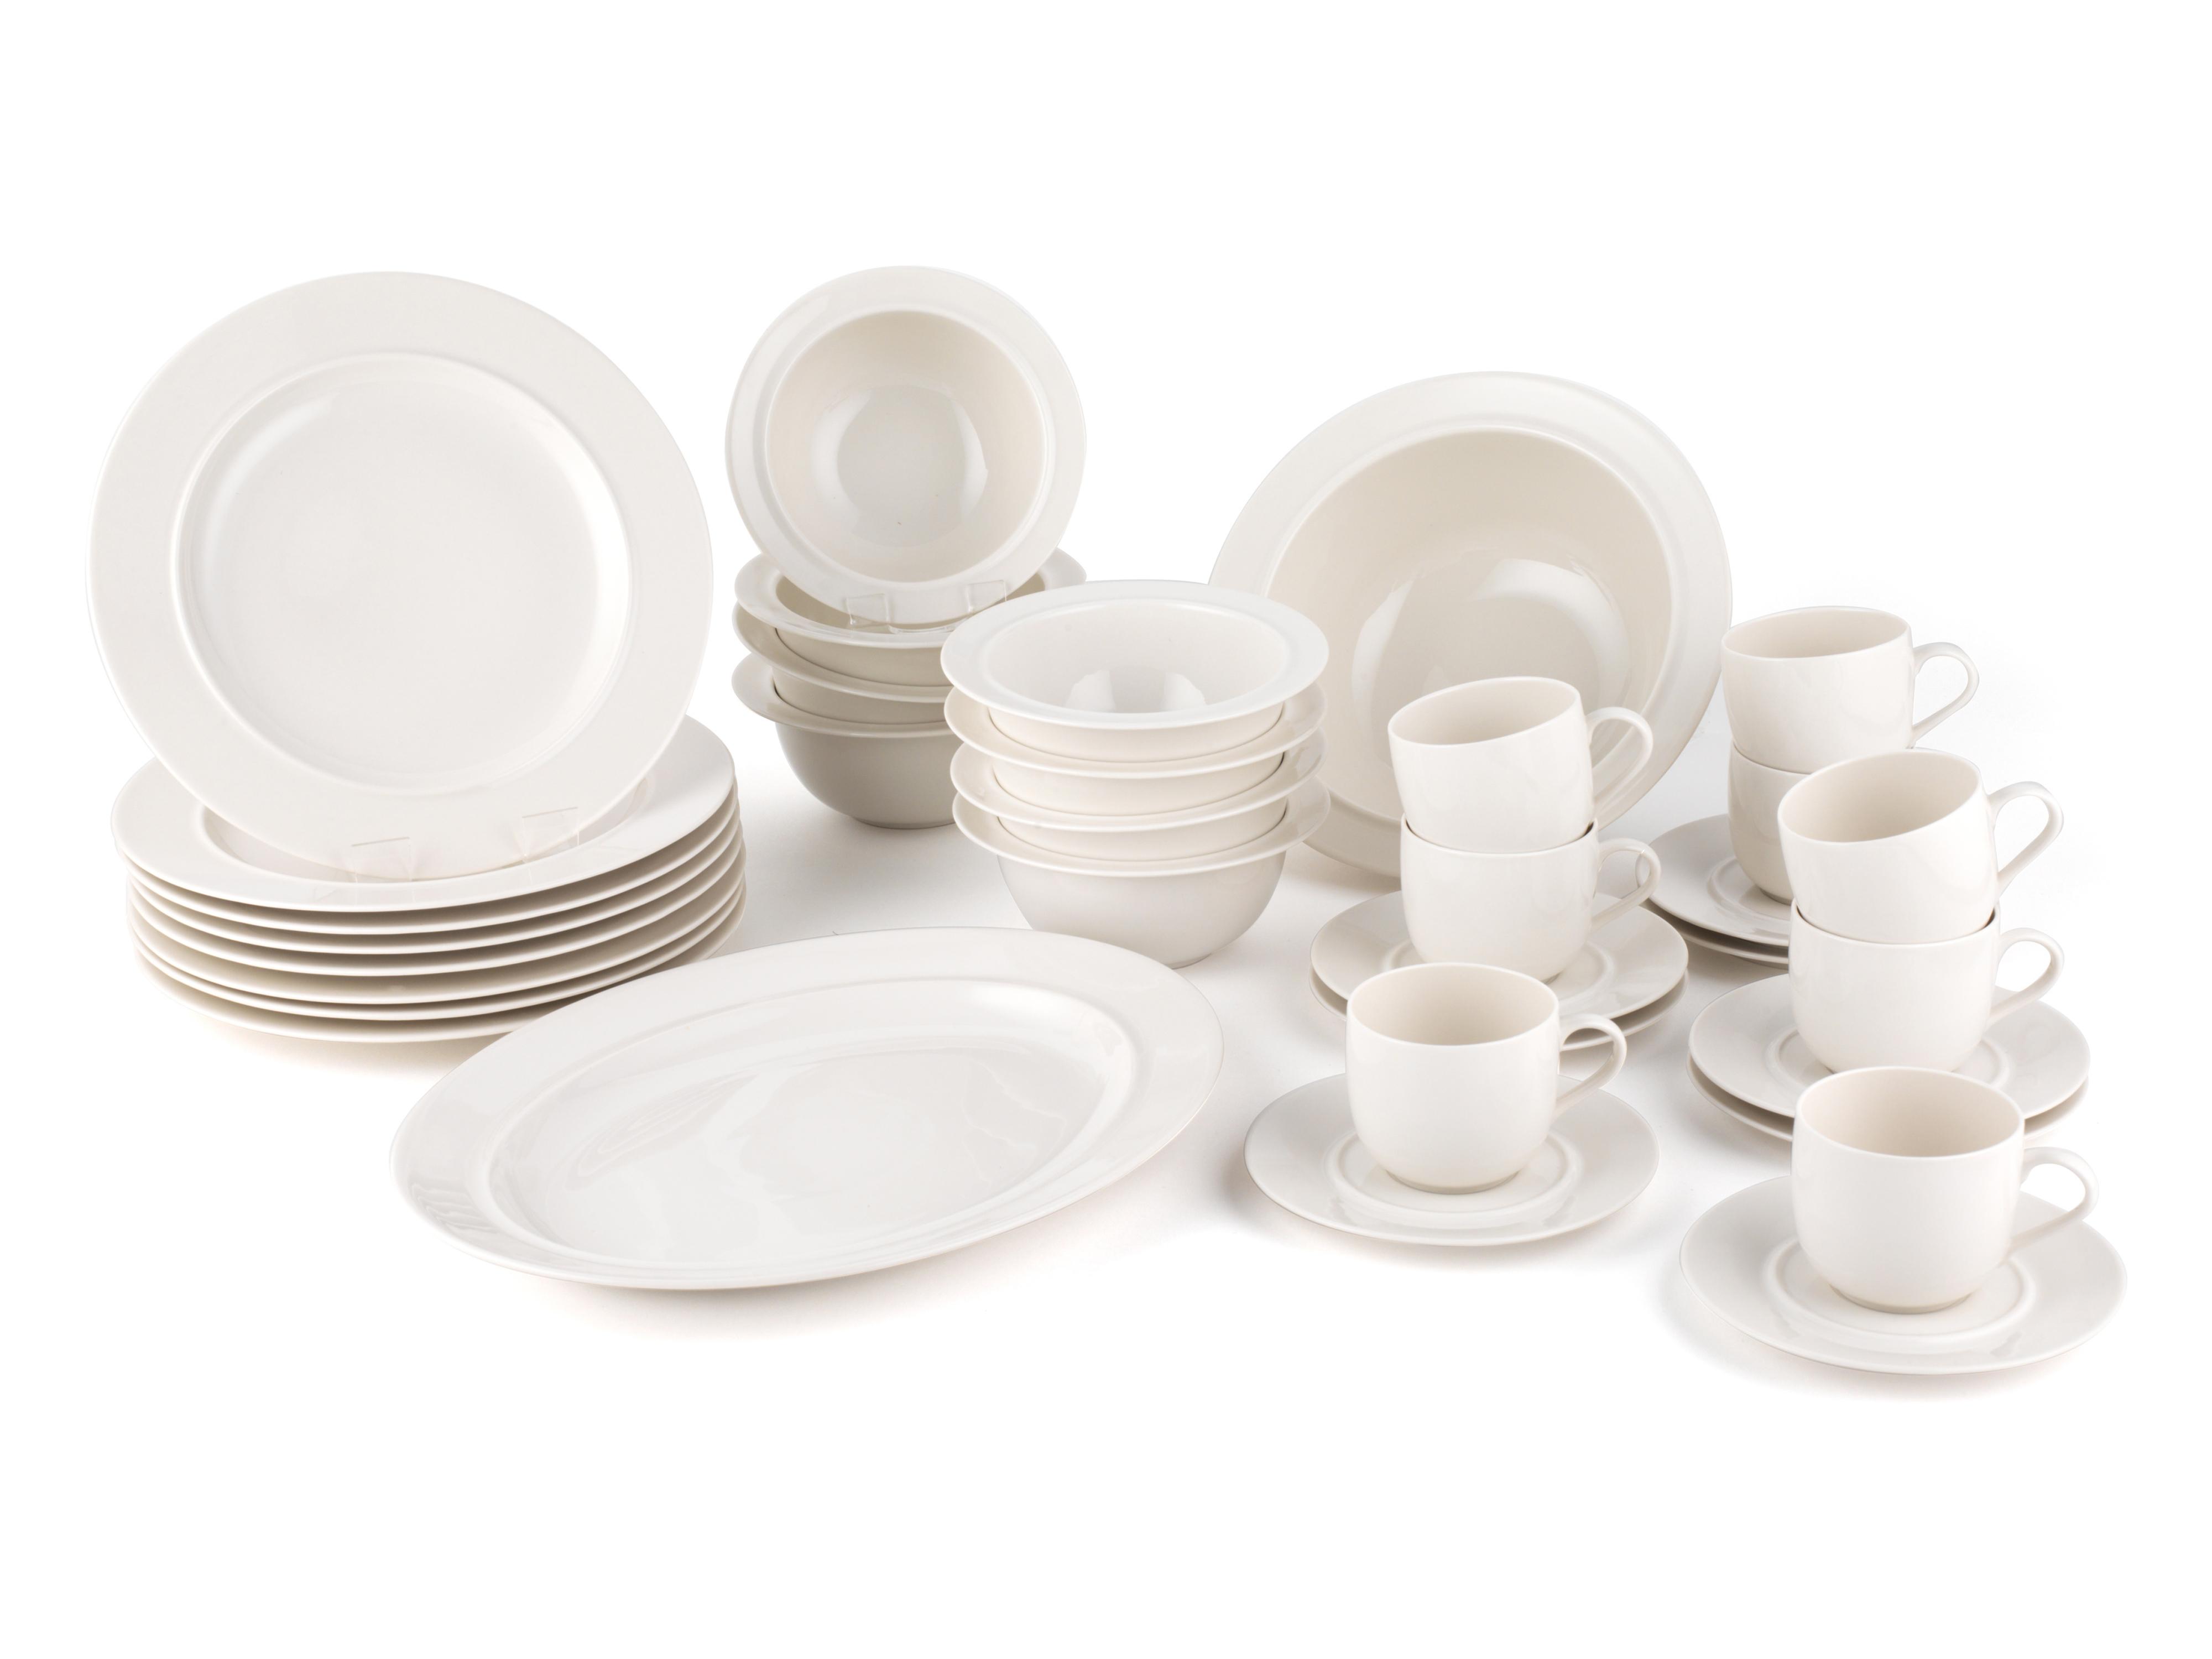 Alessi la bella tavola porcelain 8 place setting dining - Alessi la bella tavola ...